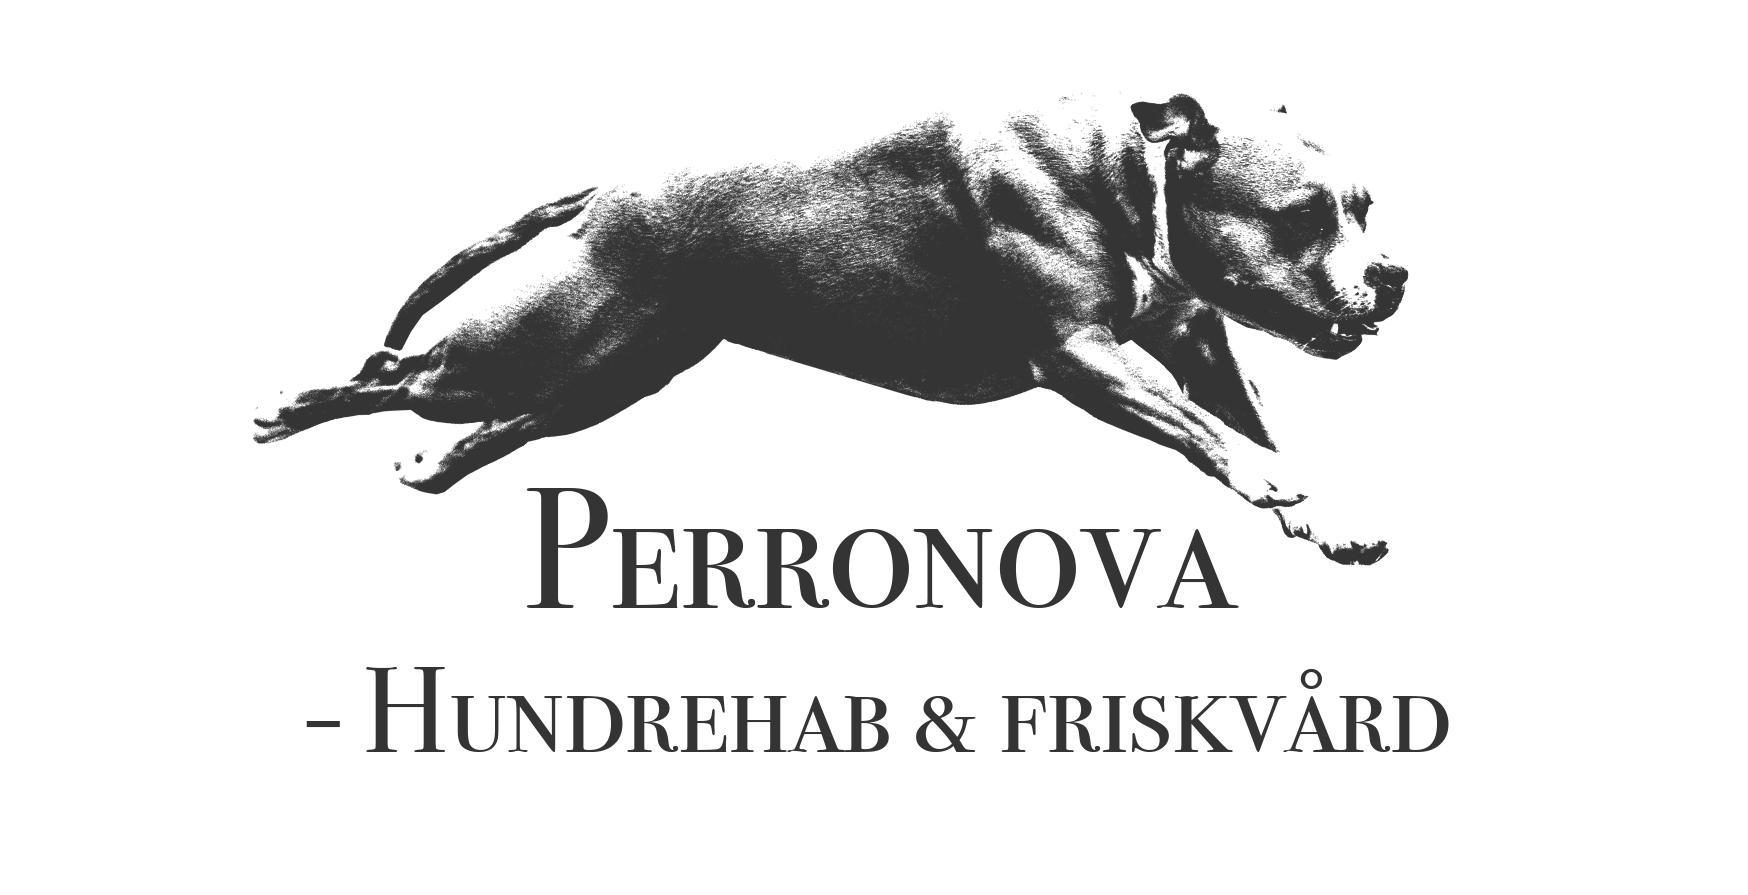 Perronova